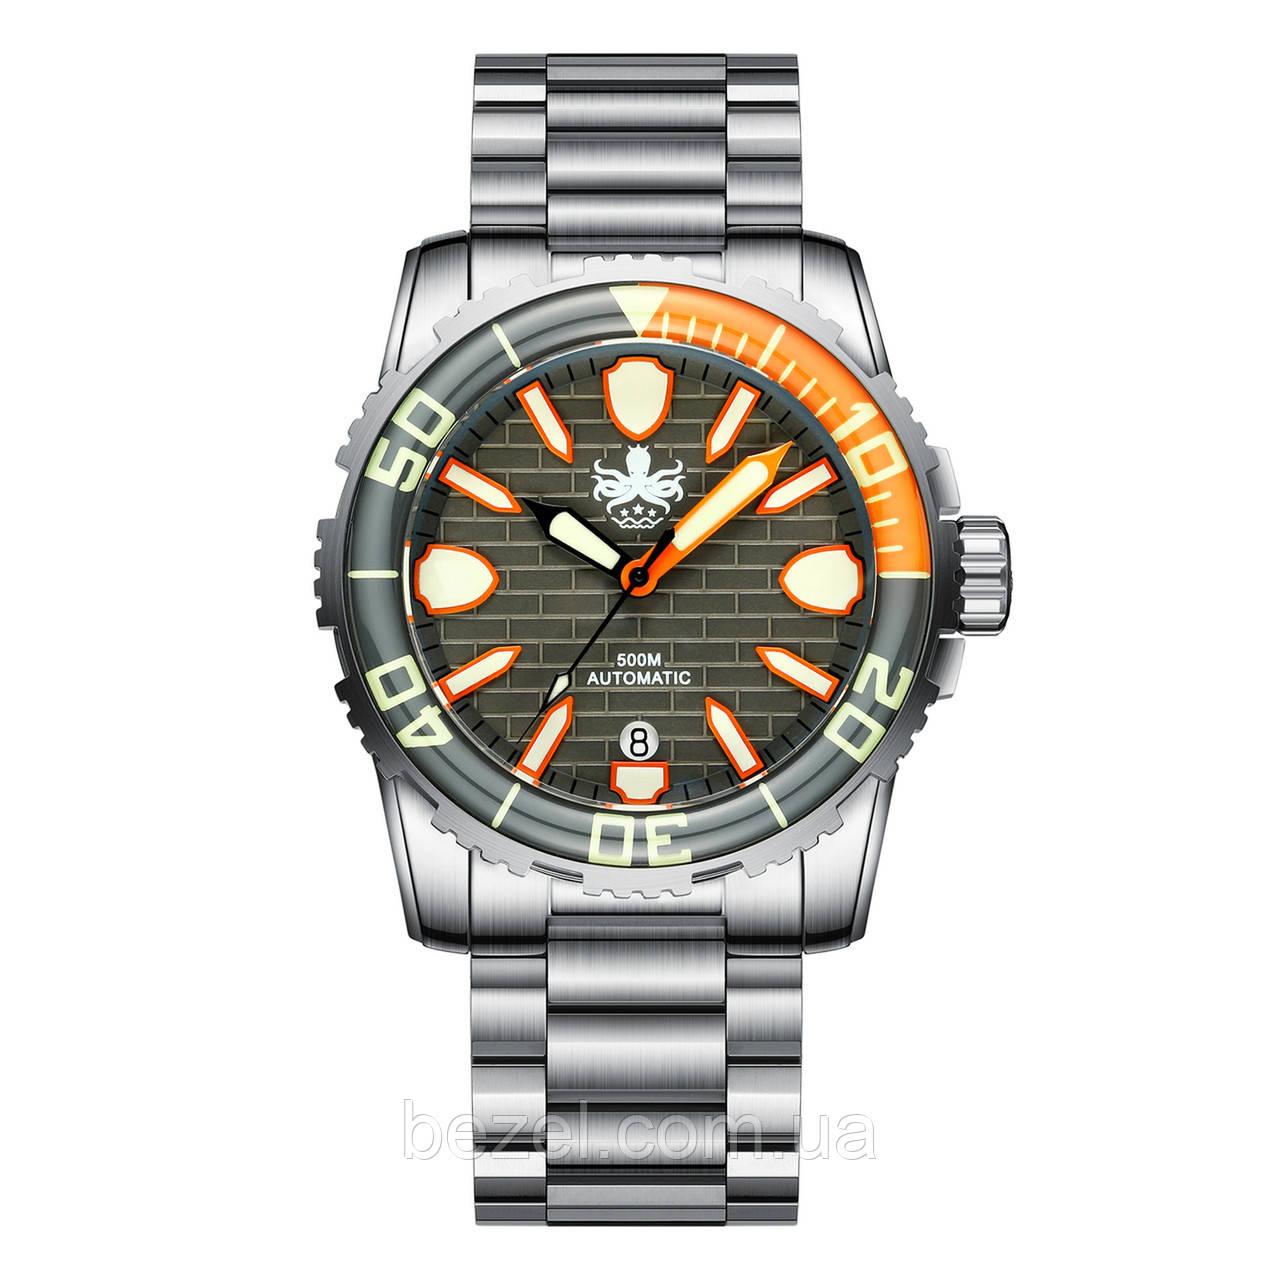 Мужские часы PHOIBOS GREAT WALL 500M Automatic Diver PY022D Grey-Orange Limited Edition